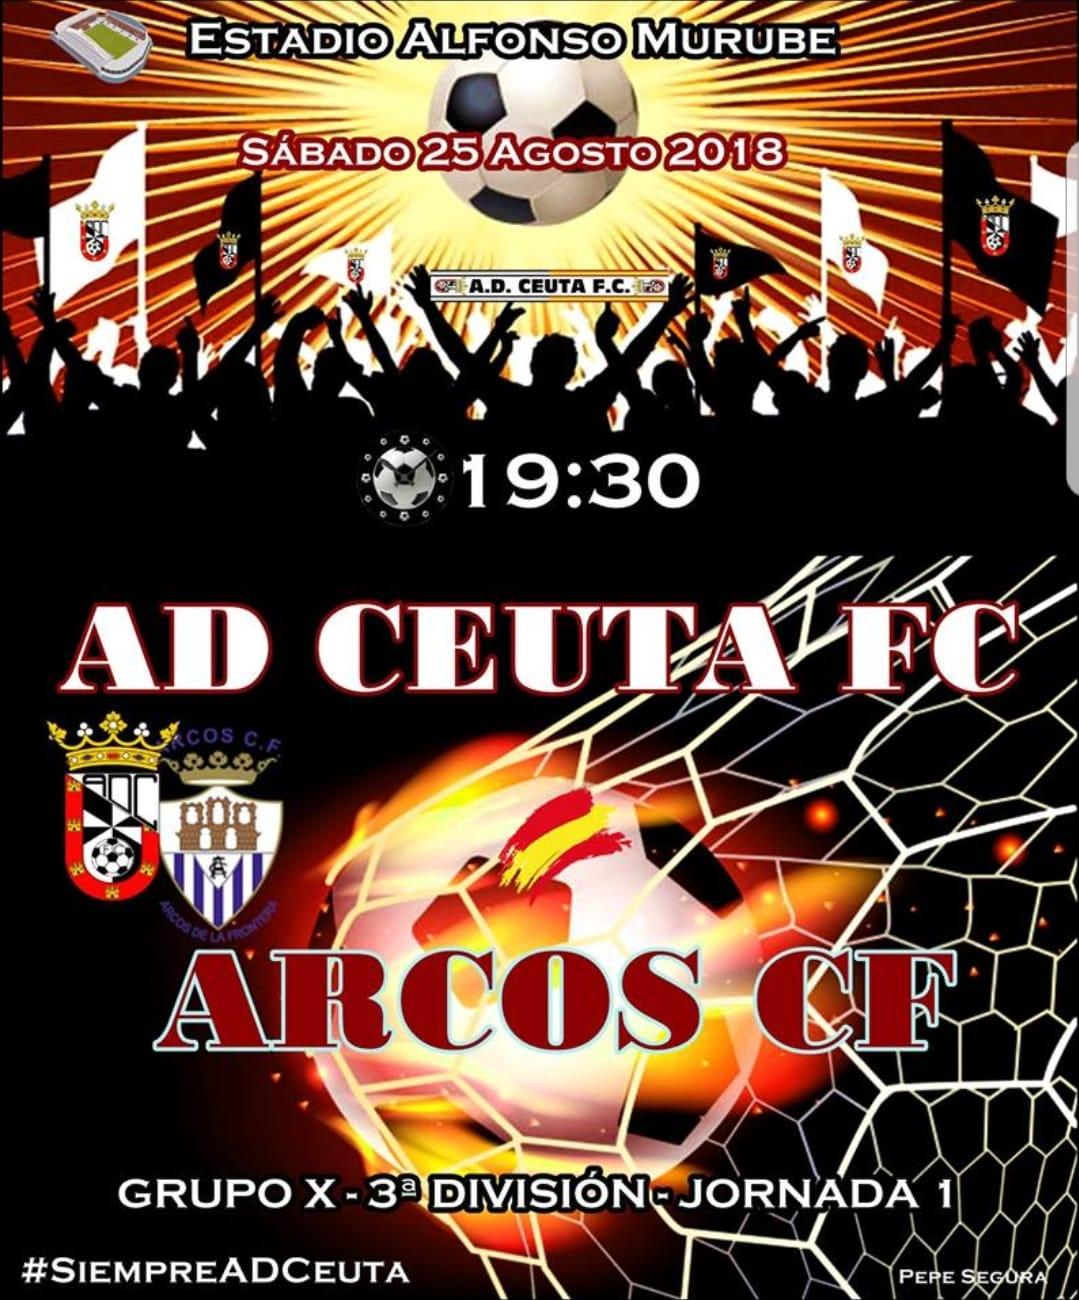 Tercera División Grupo X: 1ª Jornada de Liga AD Ceuta FC vs Arcos CF